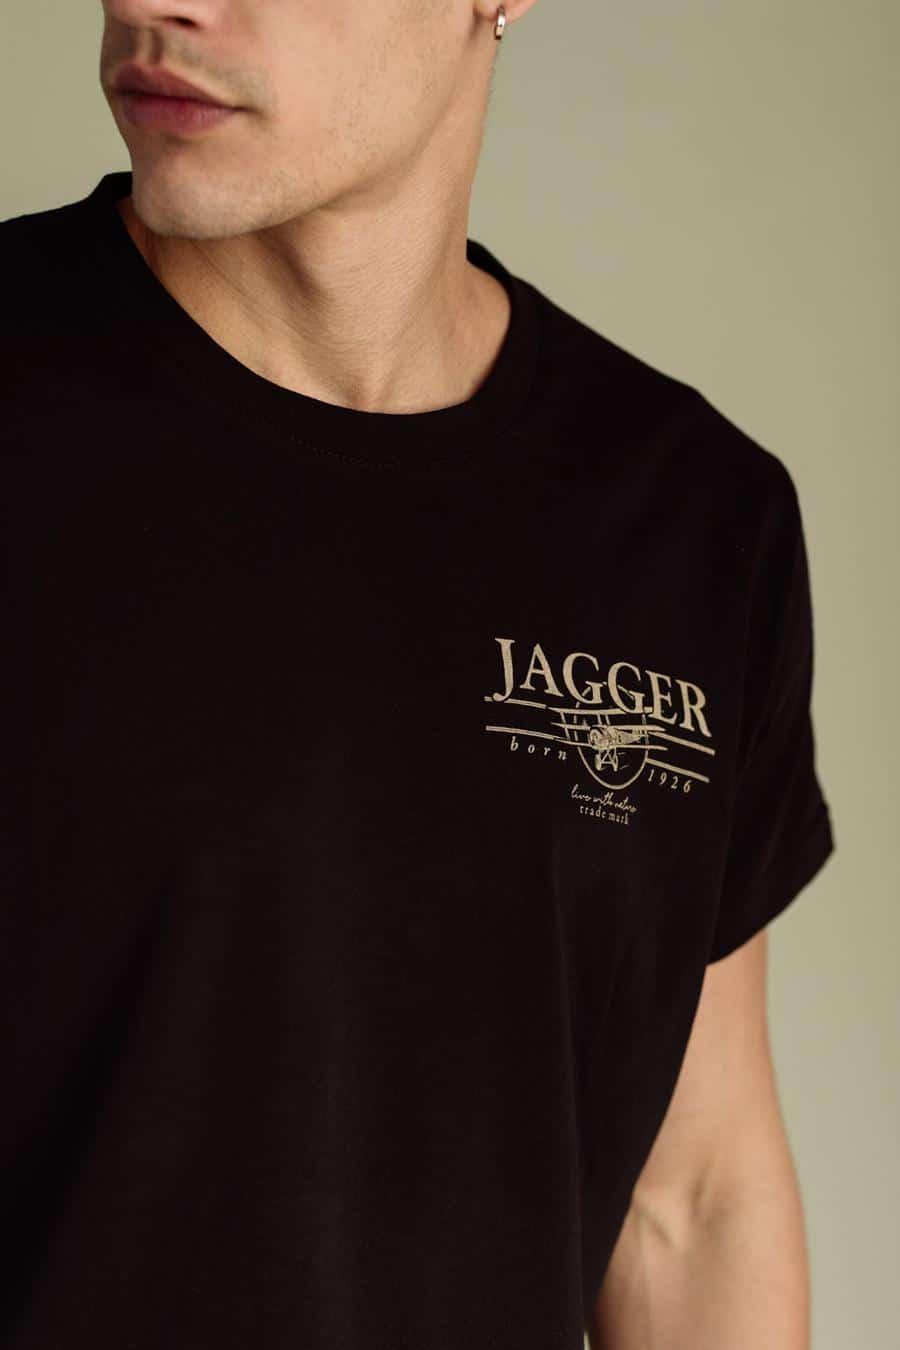 Jagger Muska Majica Kolekcija Prolece Leto Ss2021 Kupi Online Jm 3018 01 1